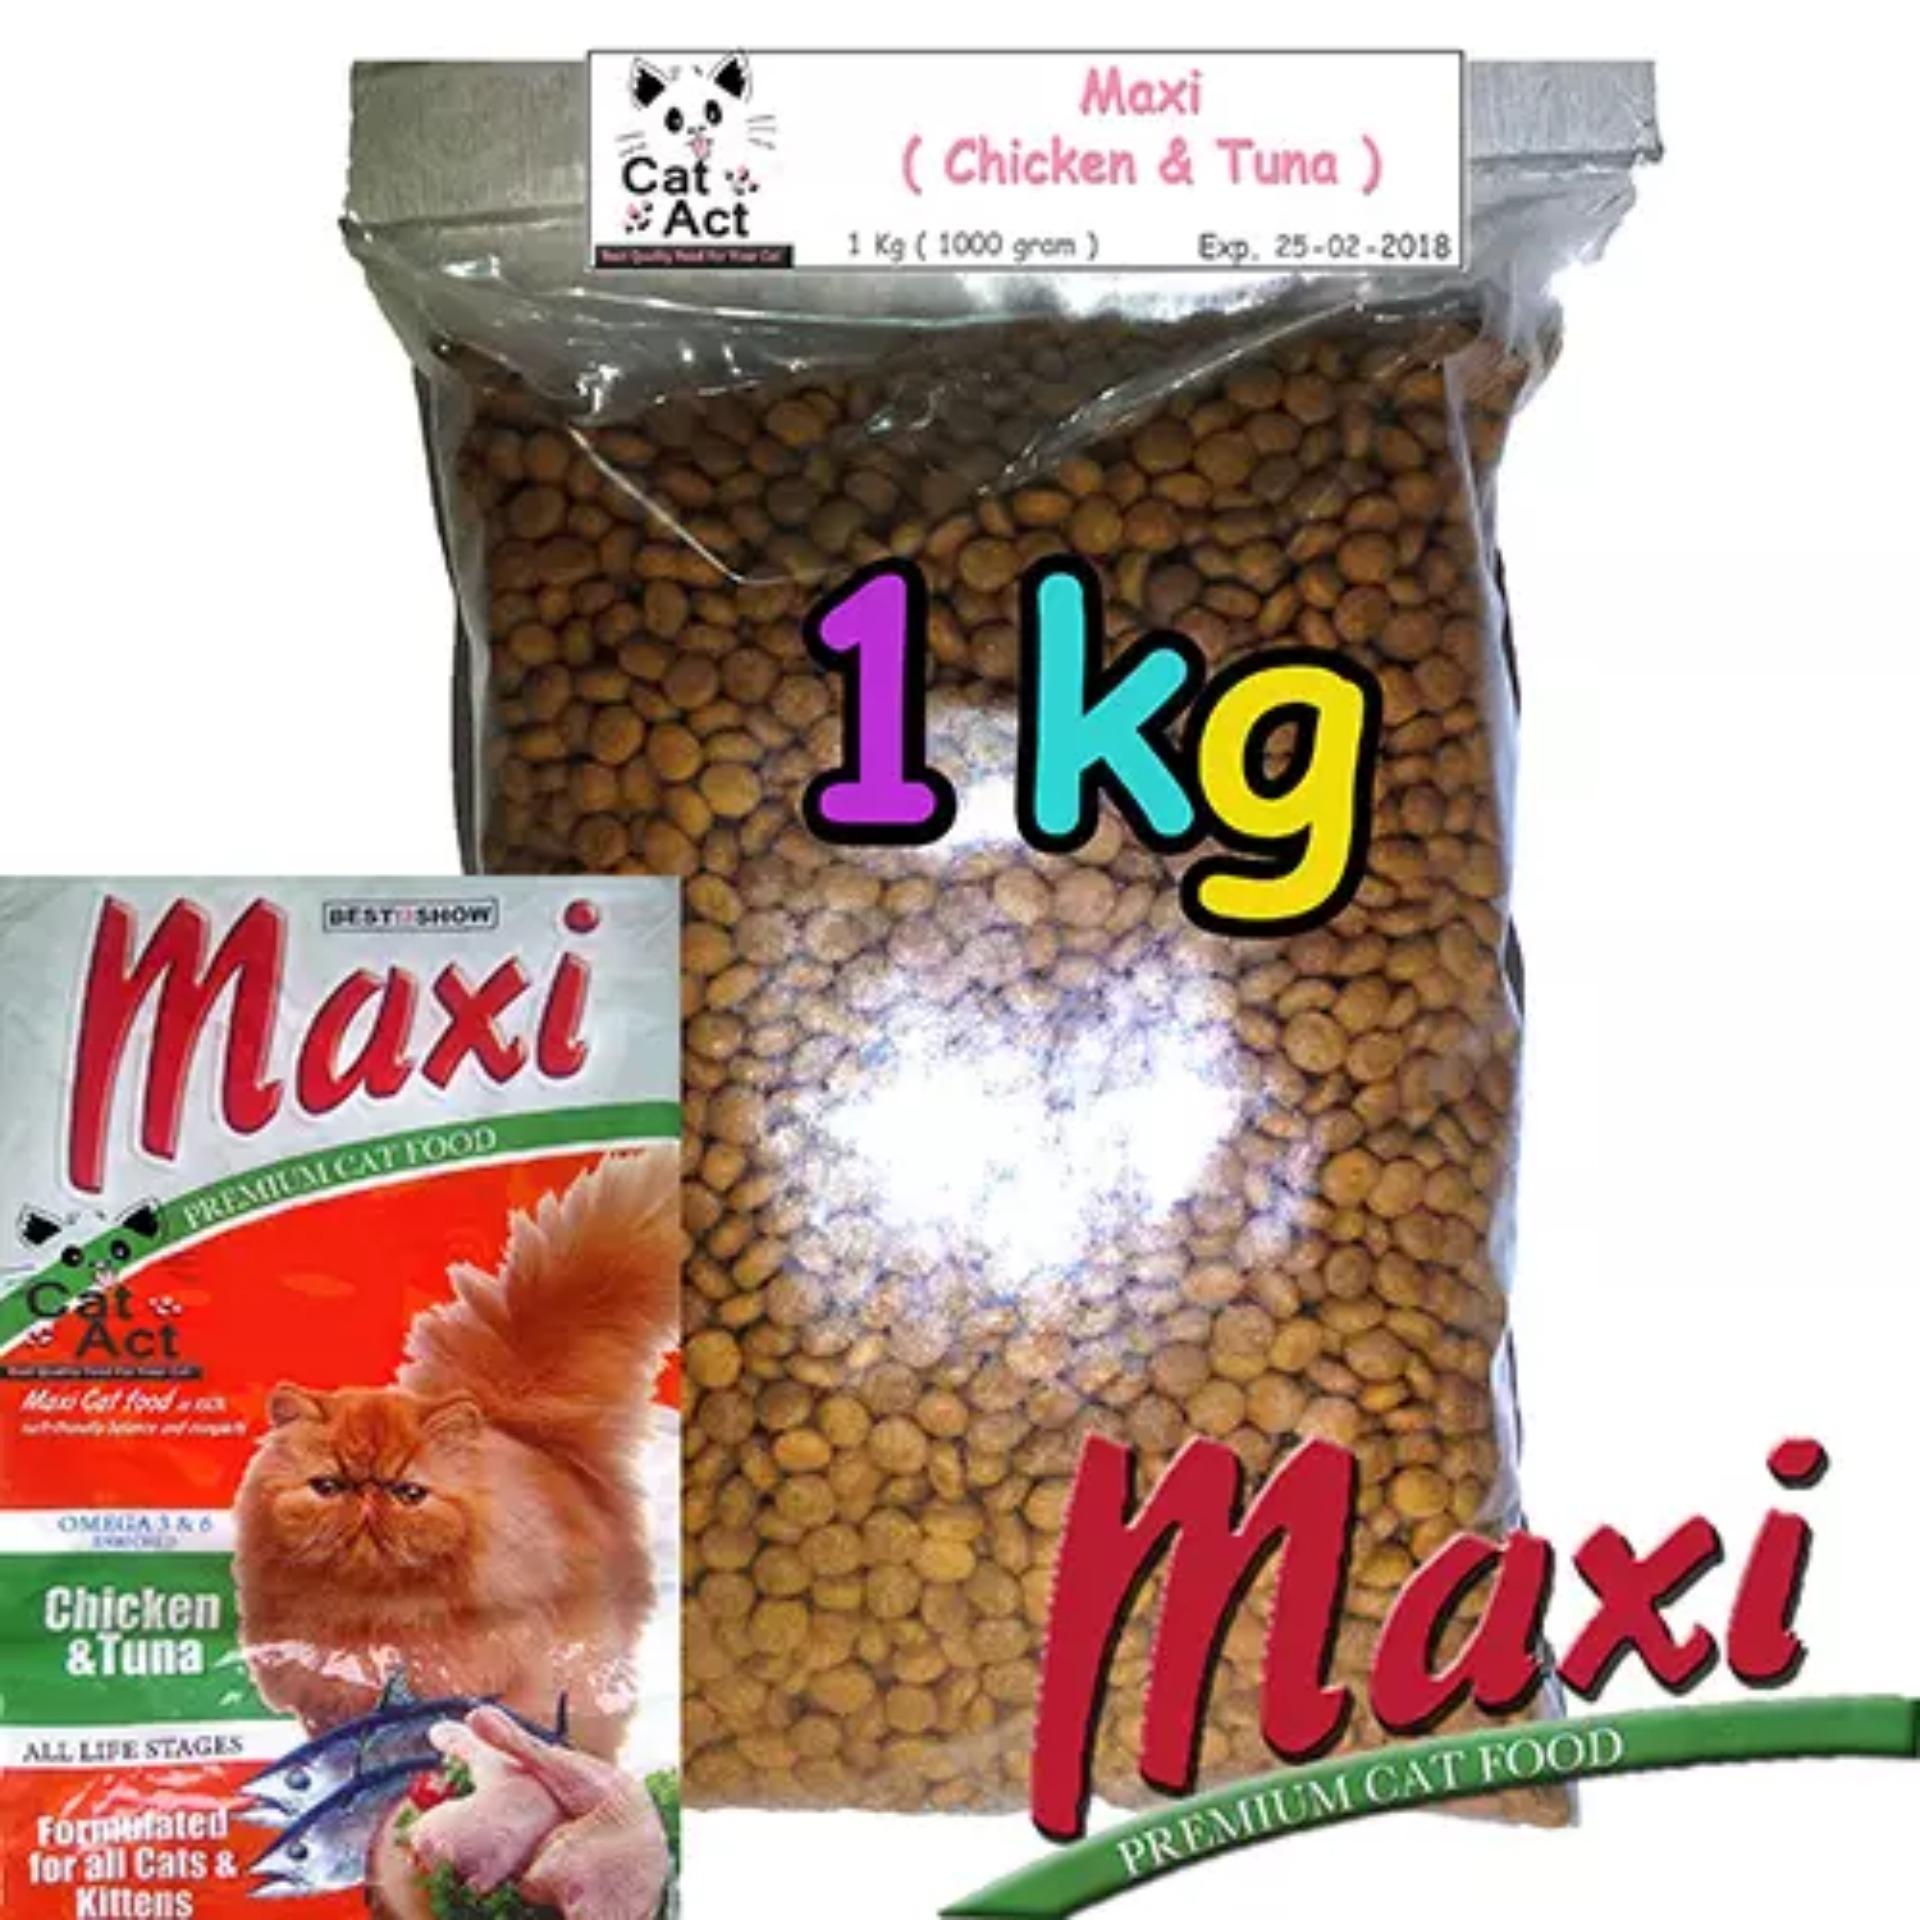 Hot Deals Makanan Kucing Murah Maxi Cat Food Chicken Tuna Repack Nice 1kg 1 Kg